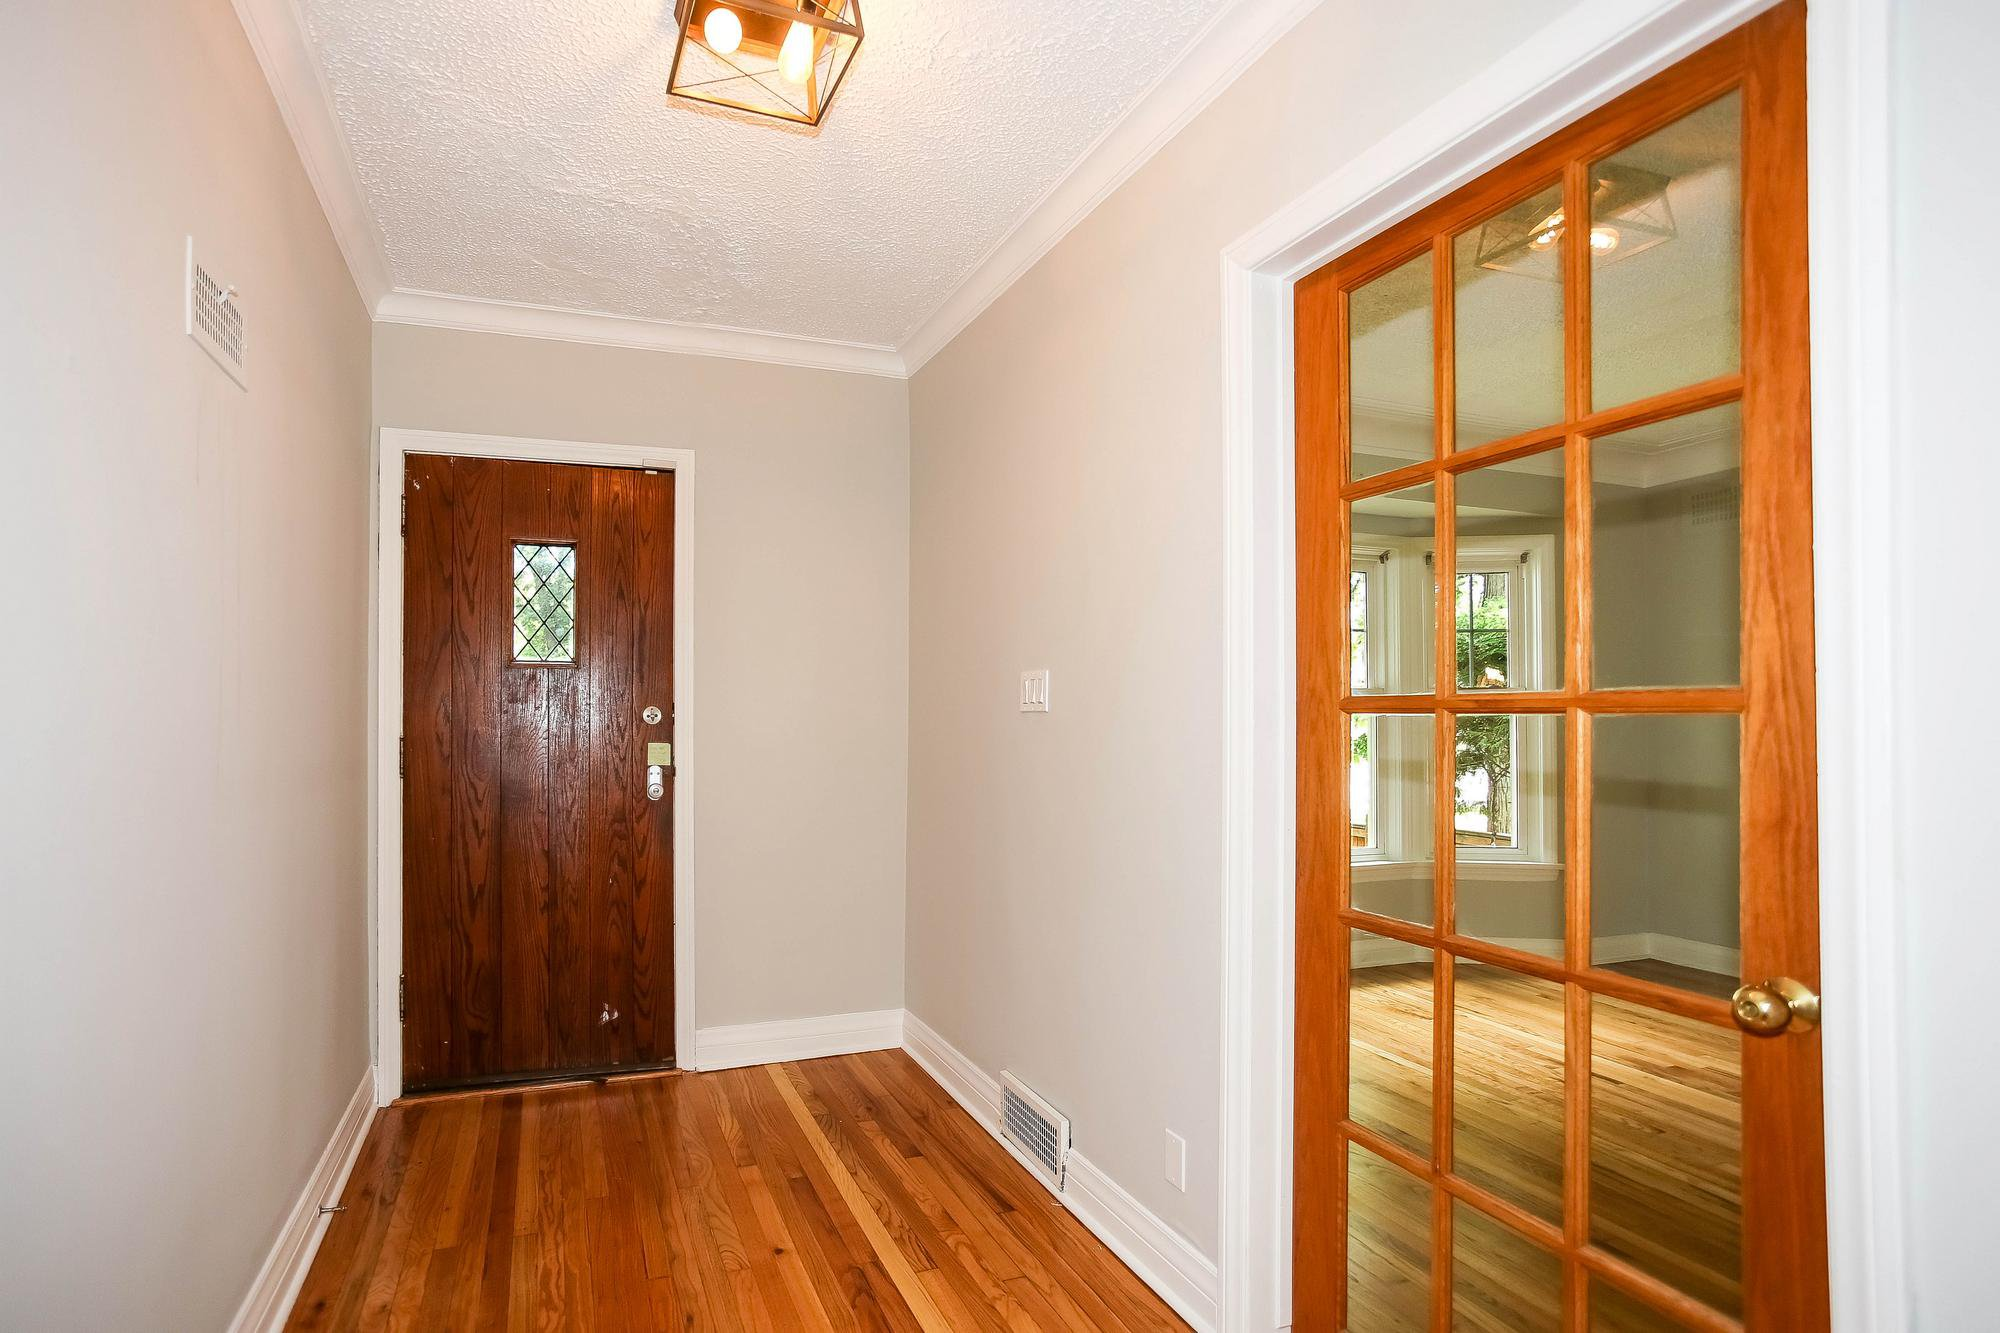 Photo 2: Photos: 155 Borebank Street in Winnipeg: River Heights Single Family Detached for sale (1C)  : MLS®# 202017166